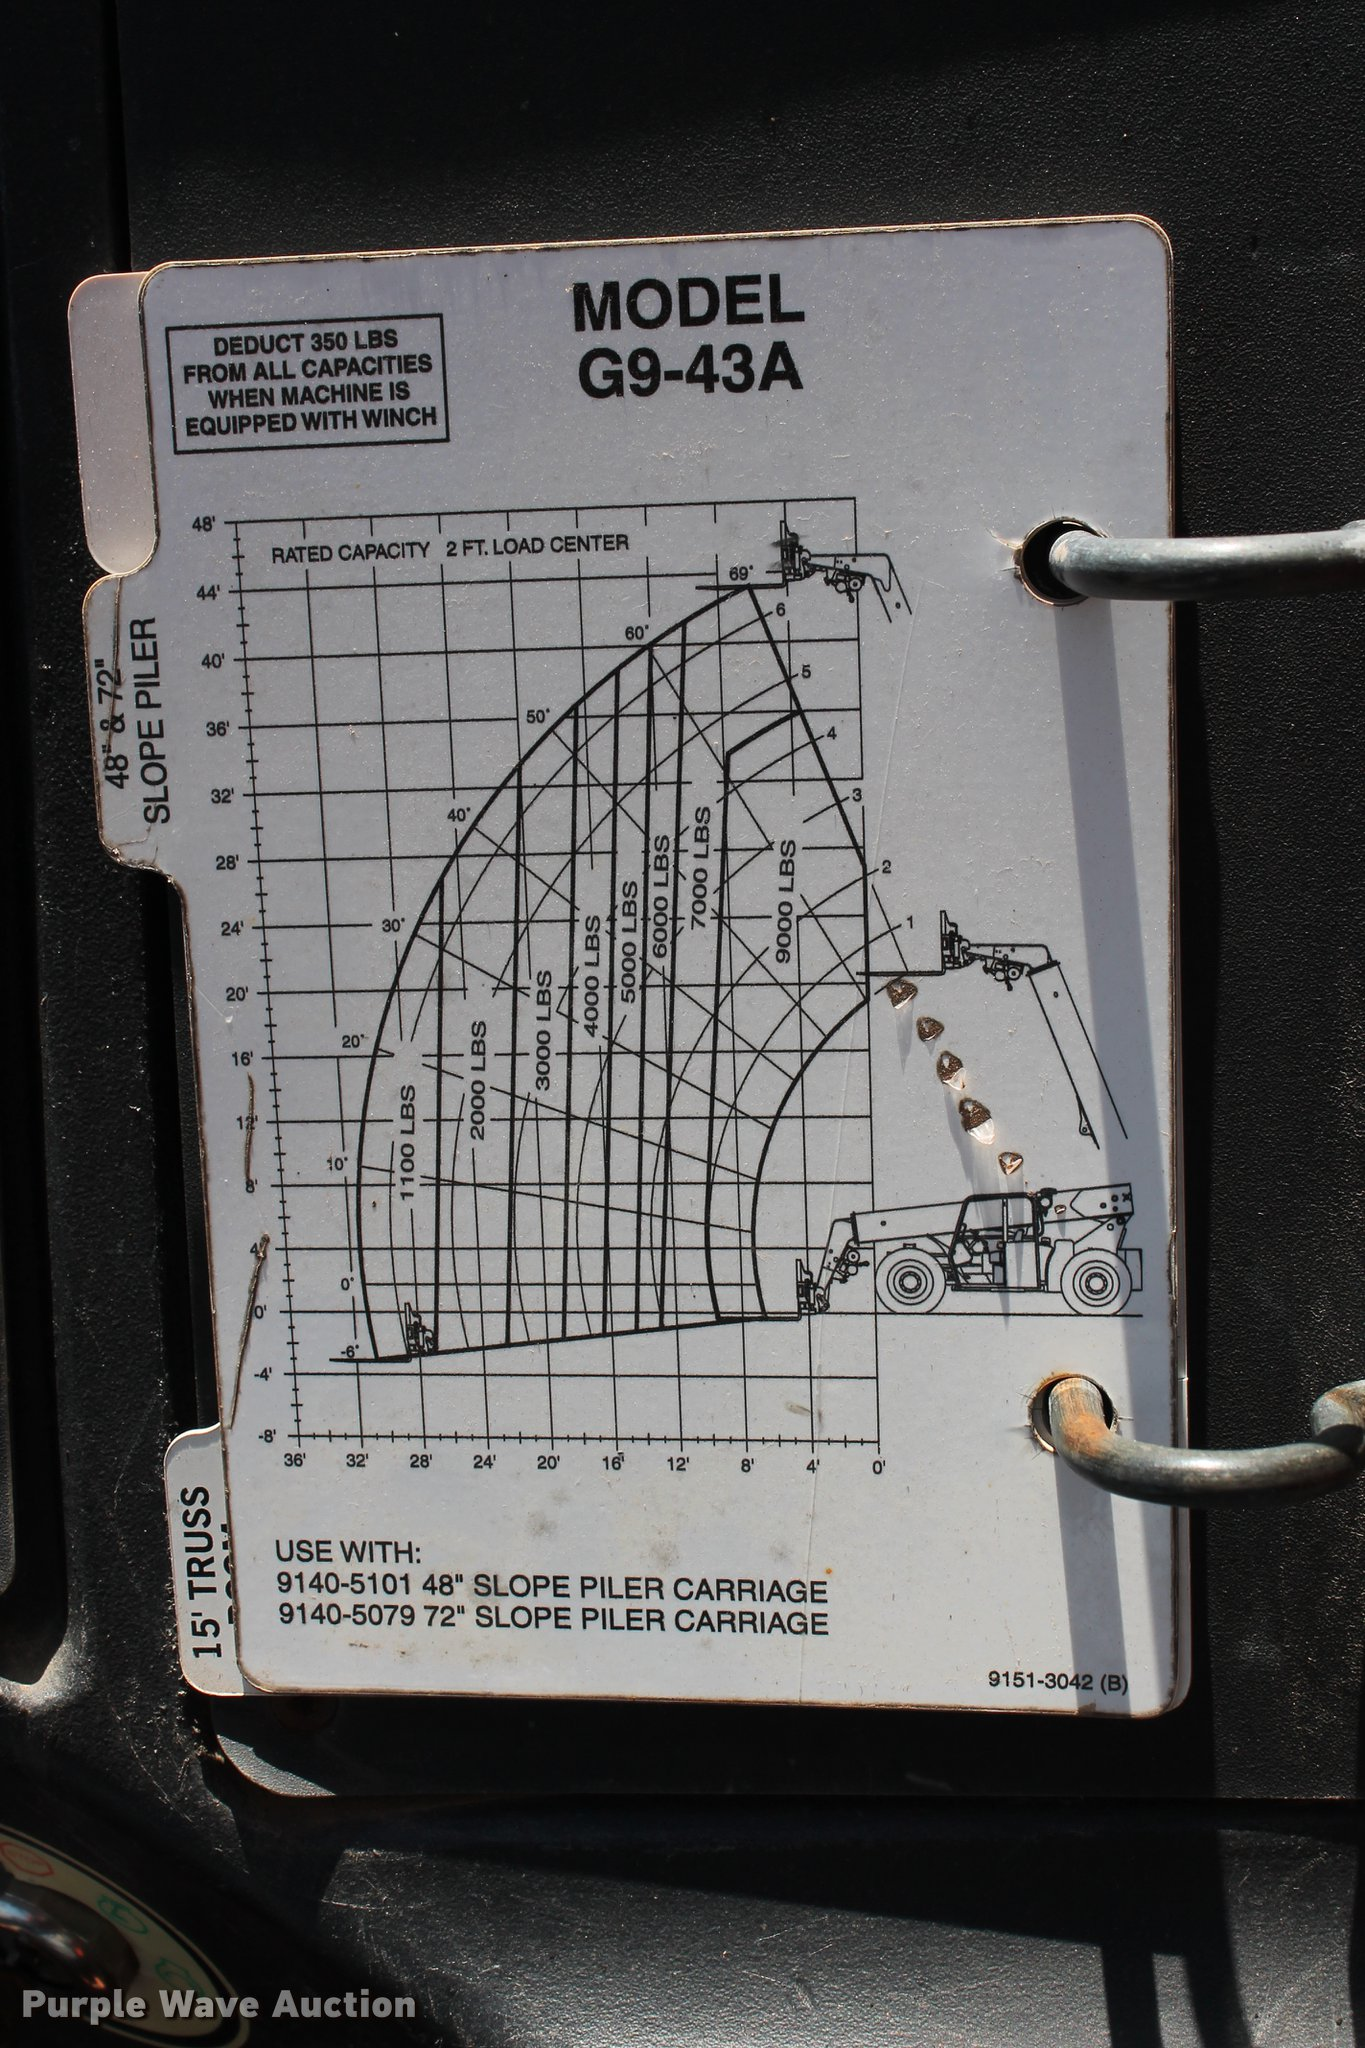 2004 Jlg Gradall G9 43a Telehandler Item Db5206 Sold Ma 20am Wiring Diagram Full Size In New Window